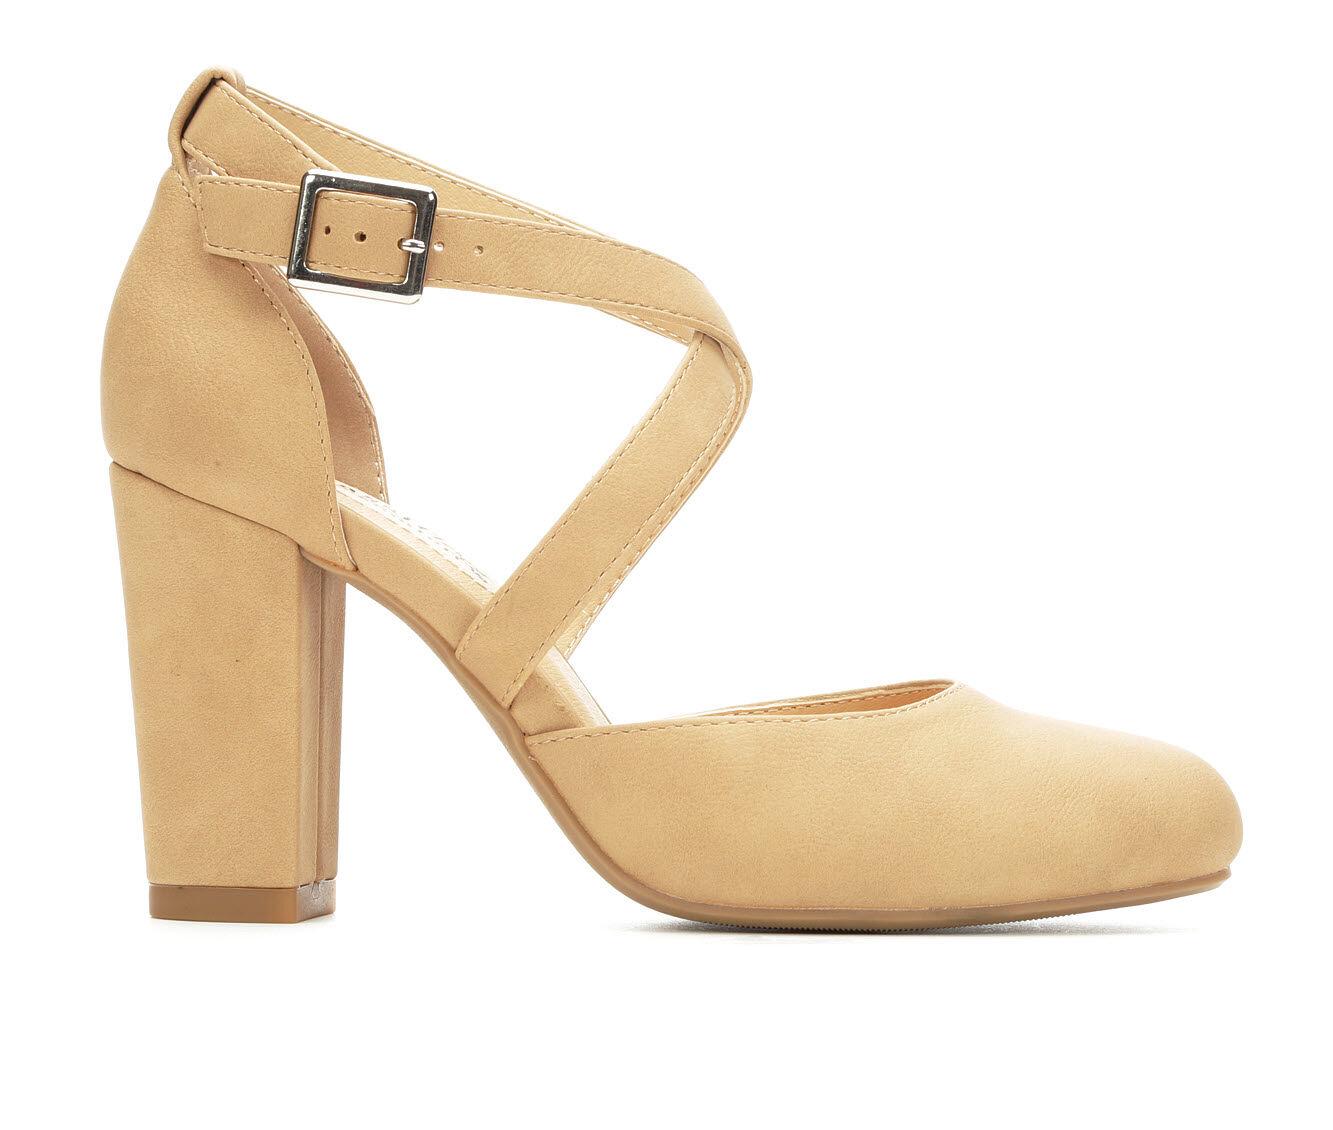 new arrivals Women's City Classified Husk Heels Natural Nub